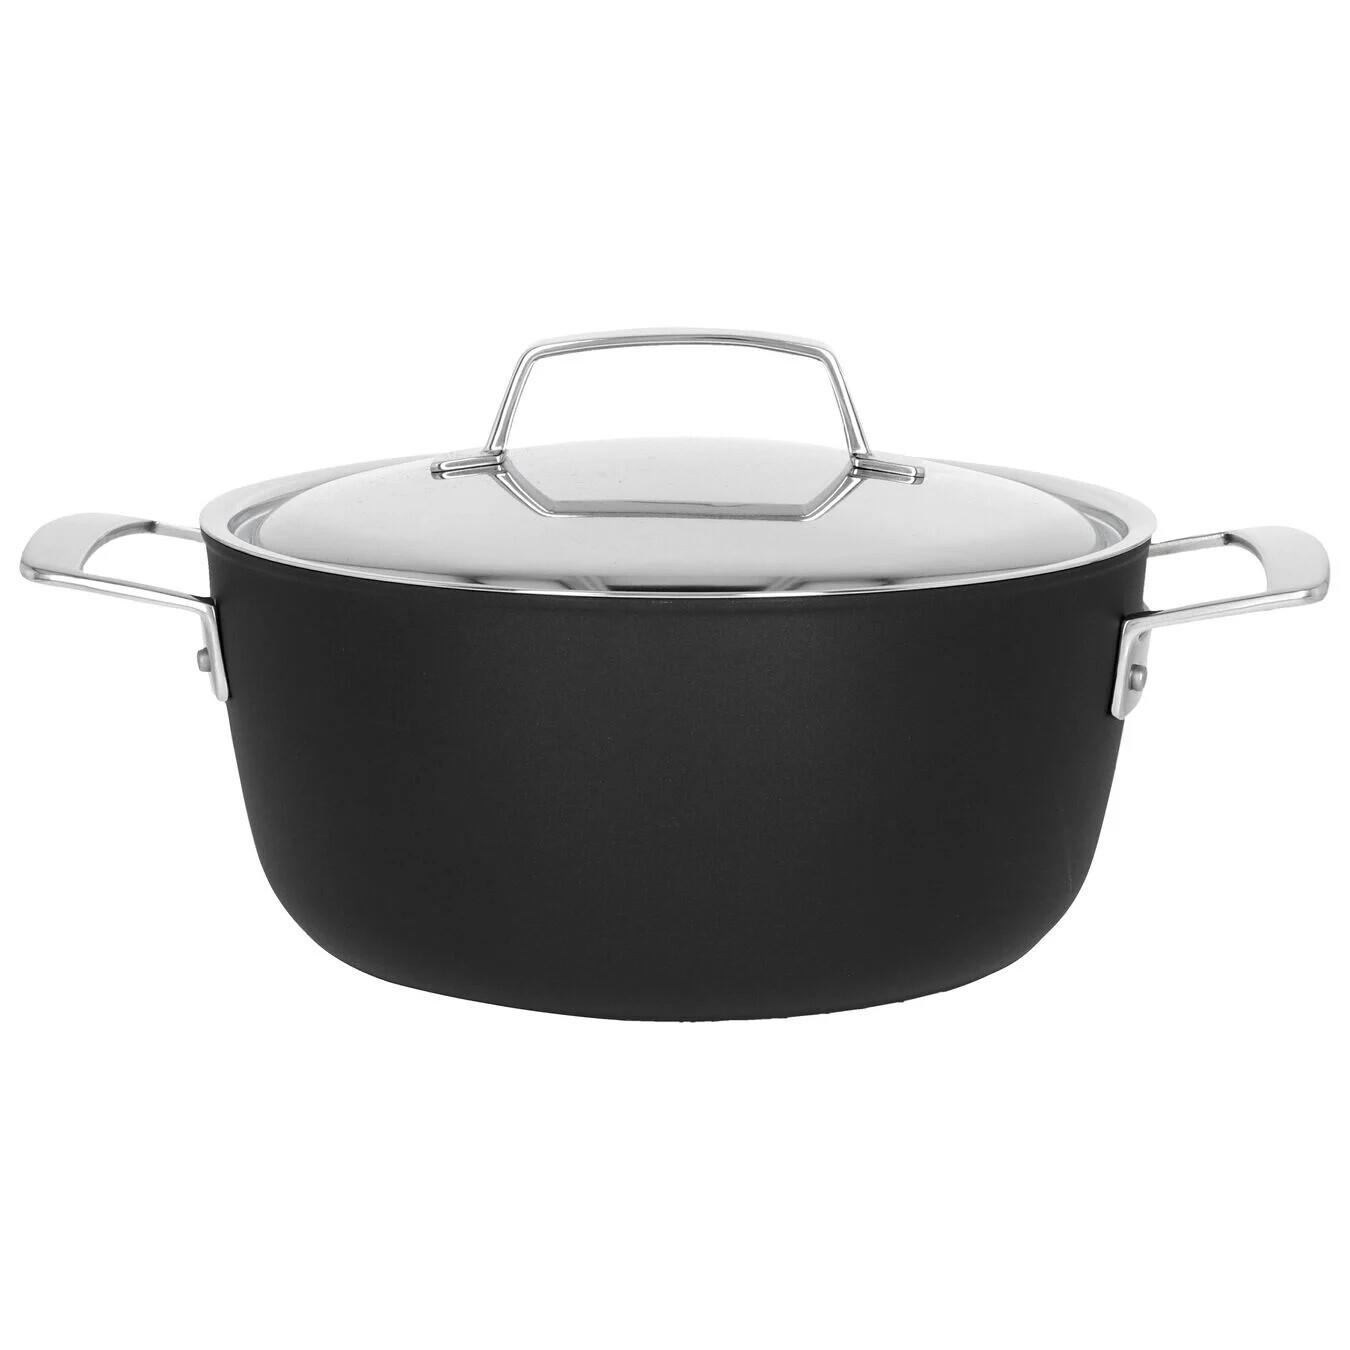 DEMEYERE 'alu pro 5 duraslide titanium' kookpot met deksel 24cm / 4,3L